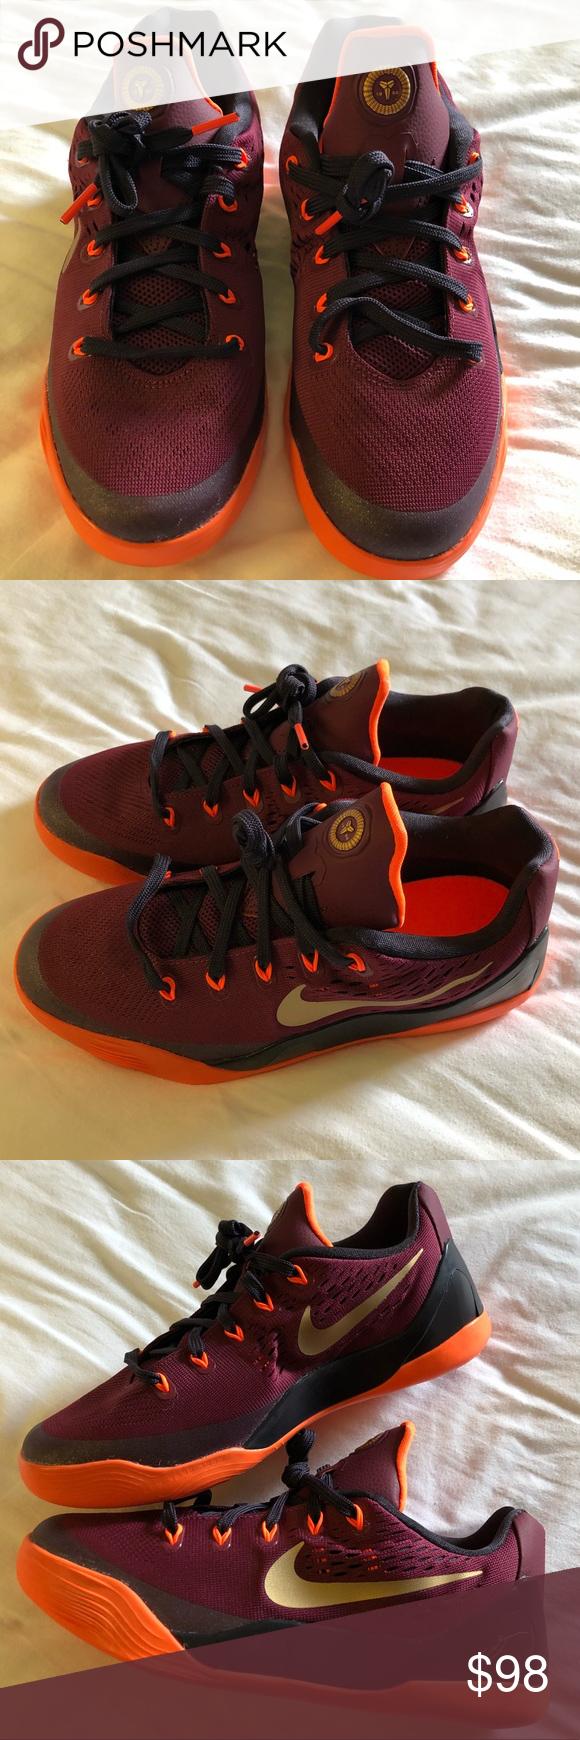 0db9b52e425 NWOT Nike kids Kobe IX Basketball shoes New Nike kids Kobe IX basketball  shoes deep garnet